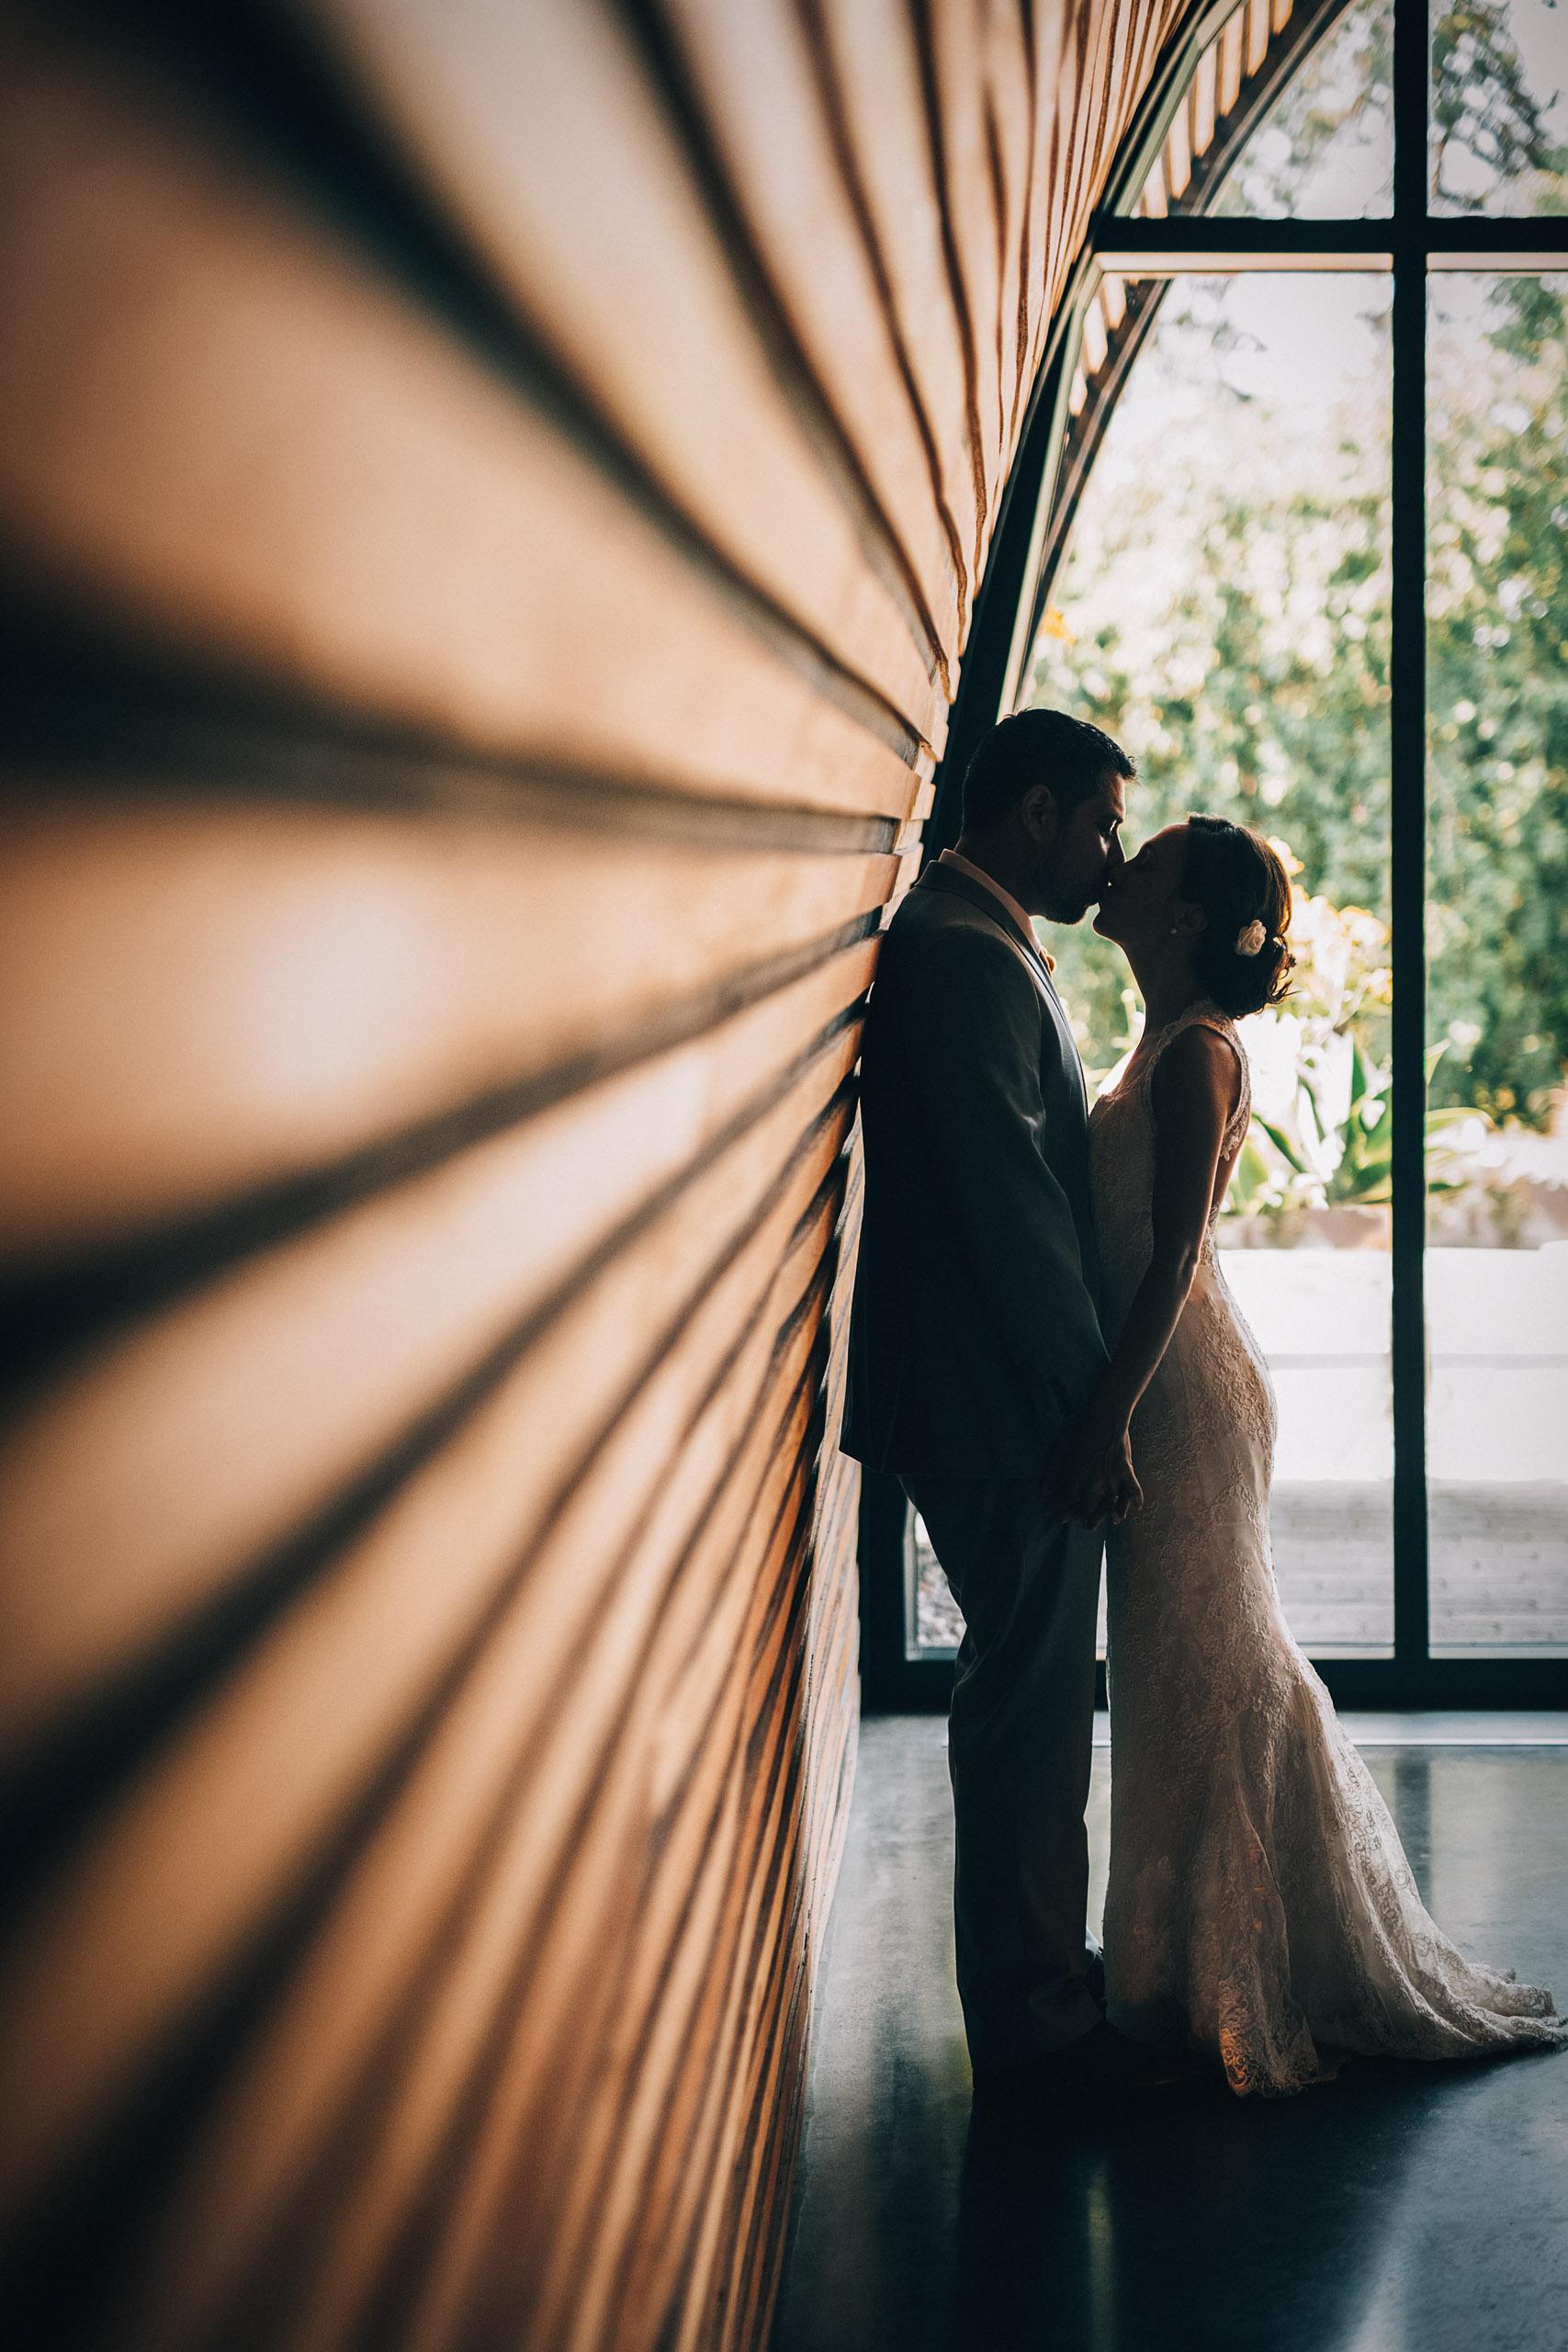 vandusen botanical garden wedding photography vancouver